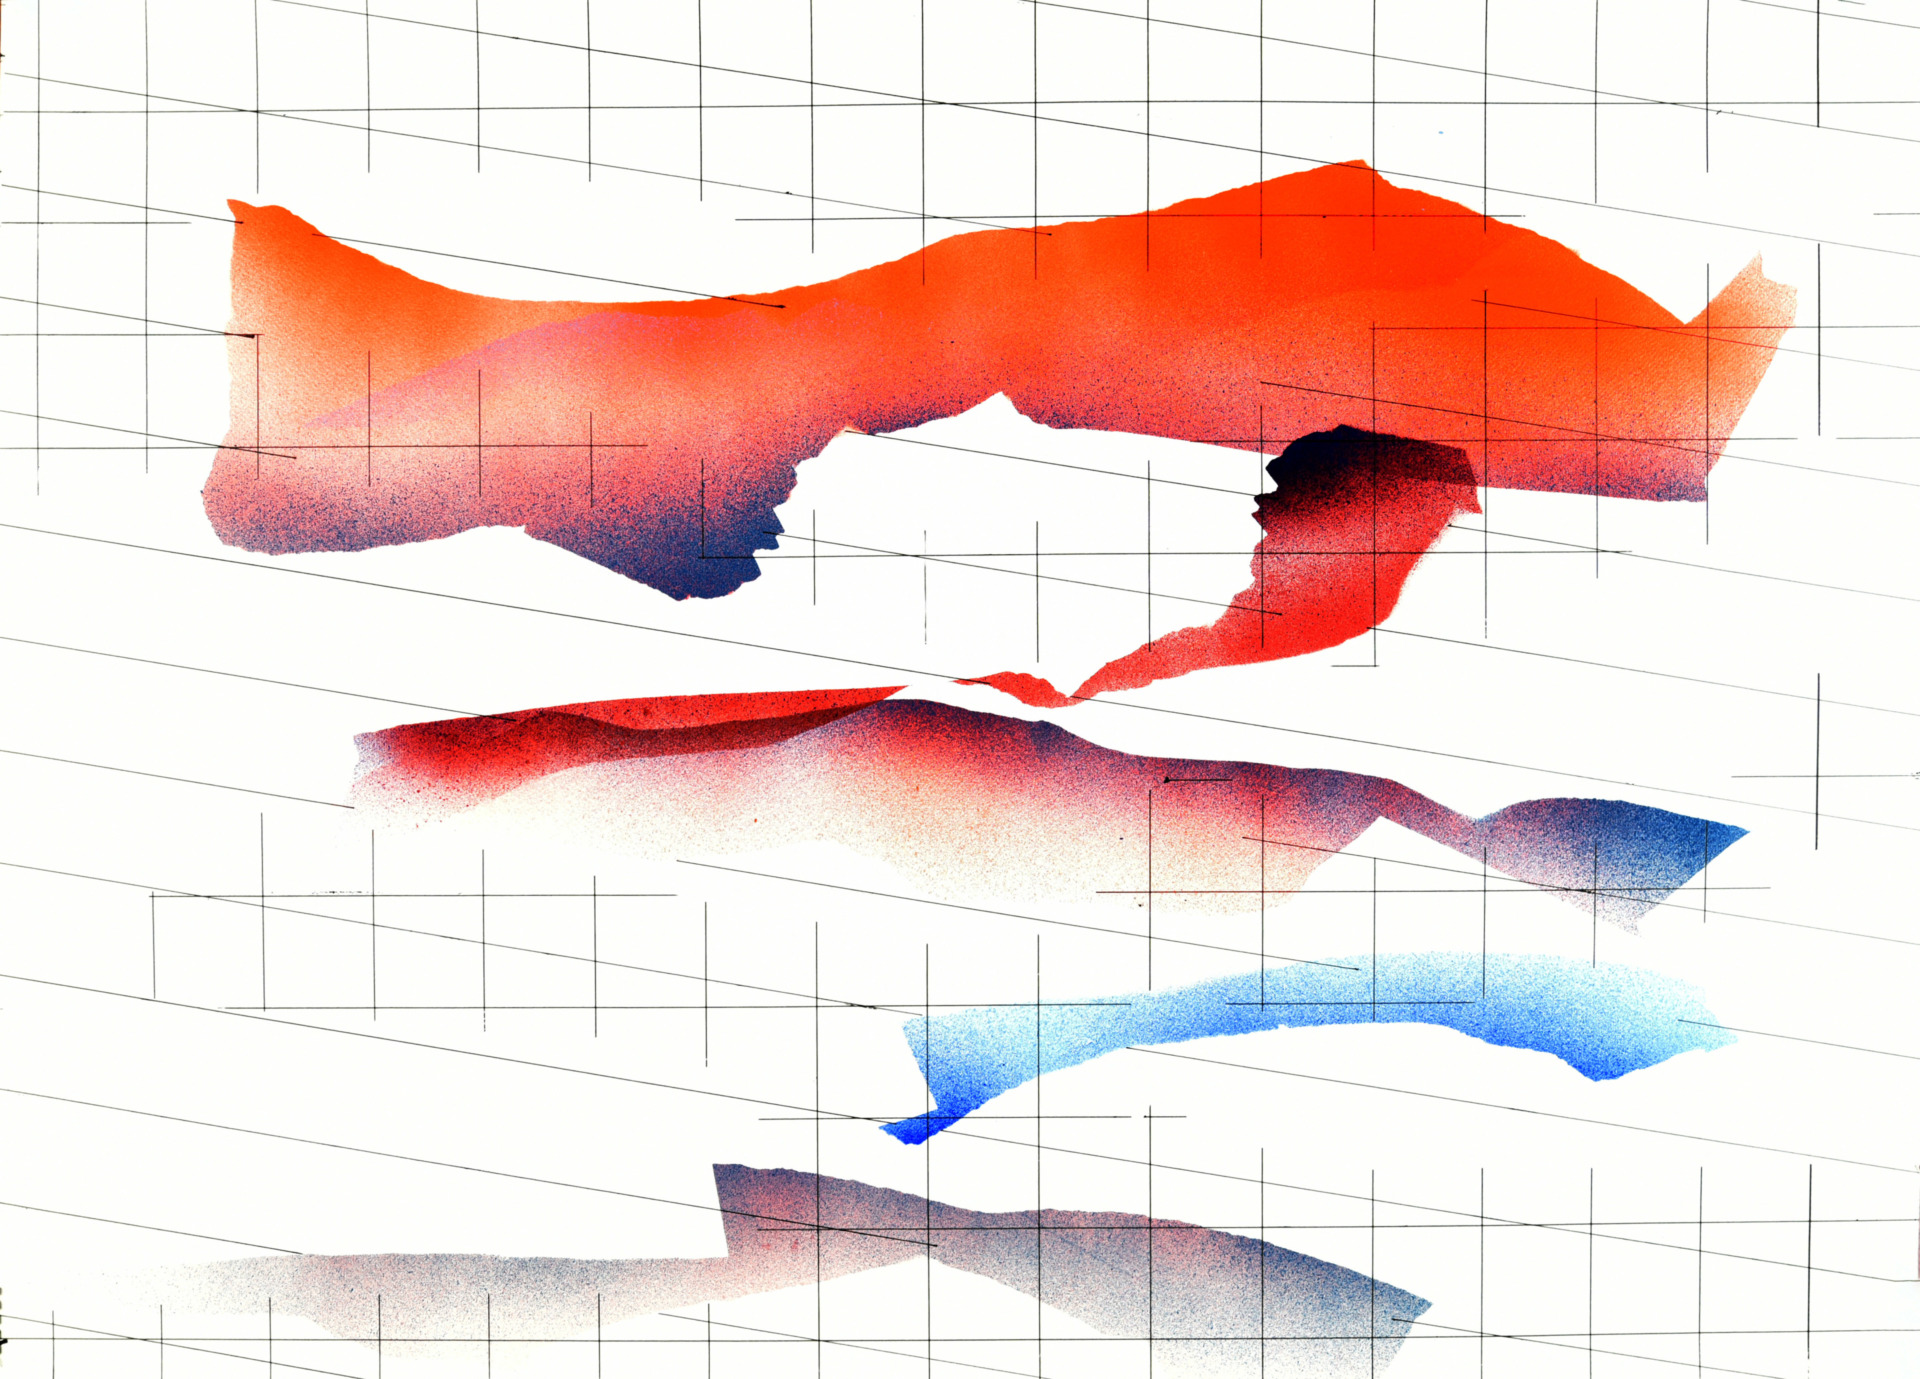 Op. 241119. Acrylic on paper, 105 x 75 cm, 2019